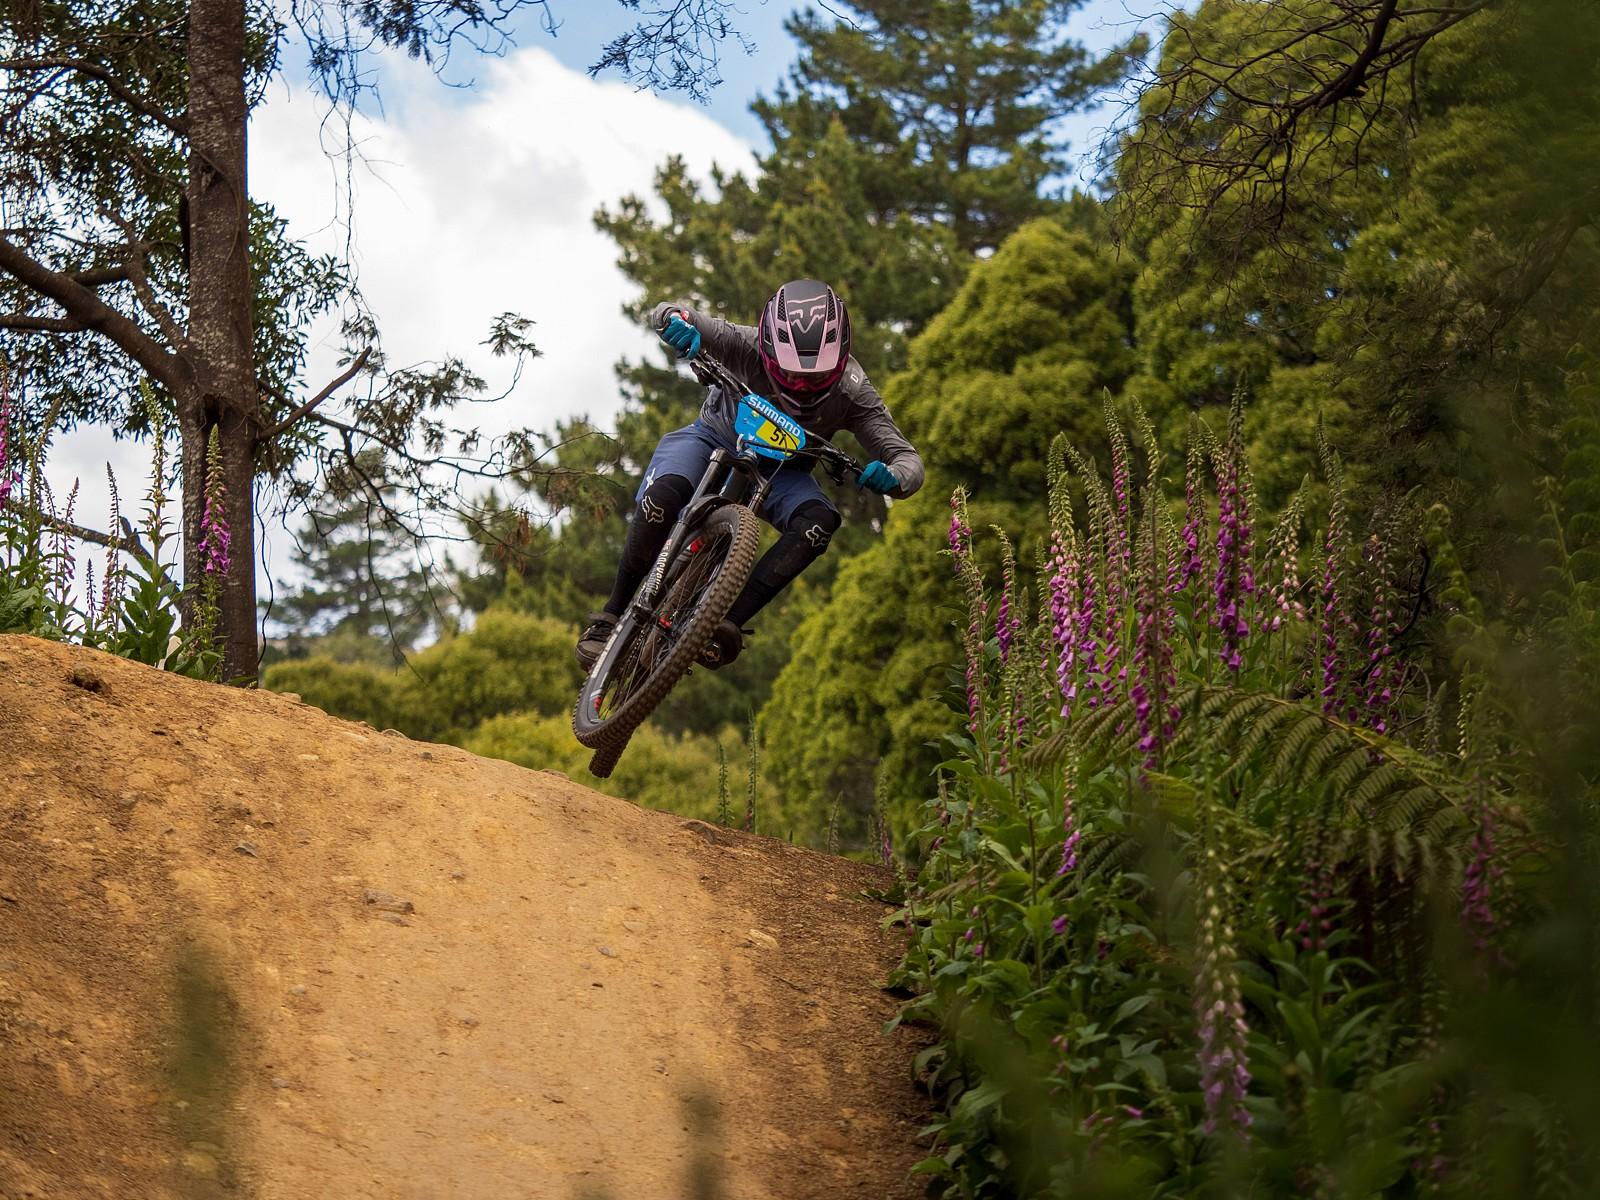 171119-Tassie-1629 - jack.fletcher86 - Mountain Biking Pictures - Vital MTB